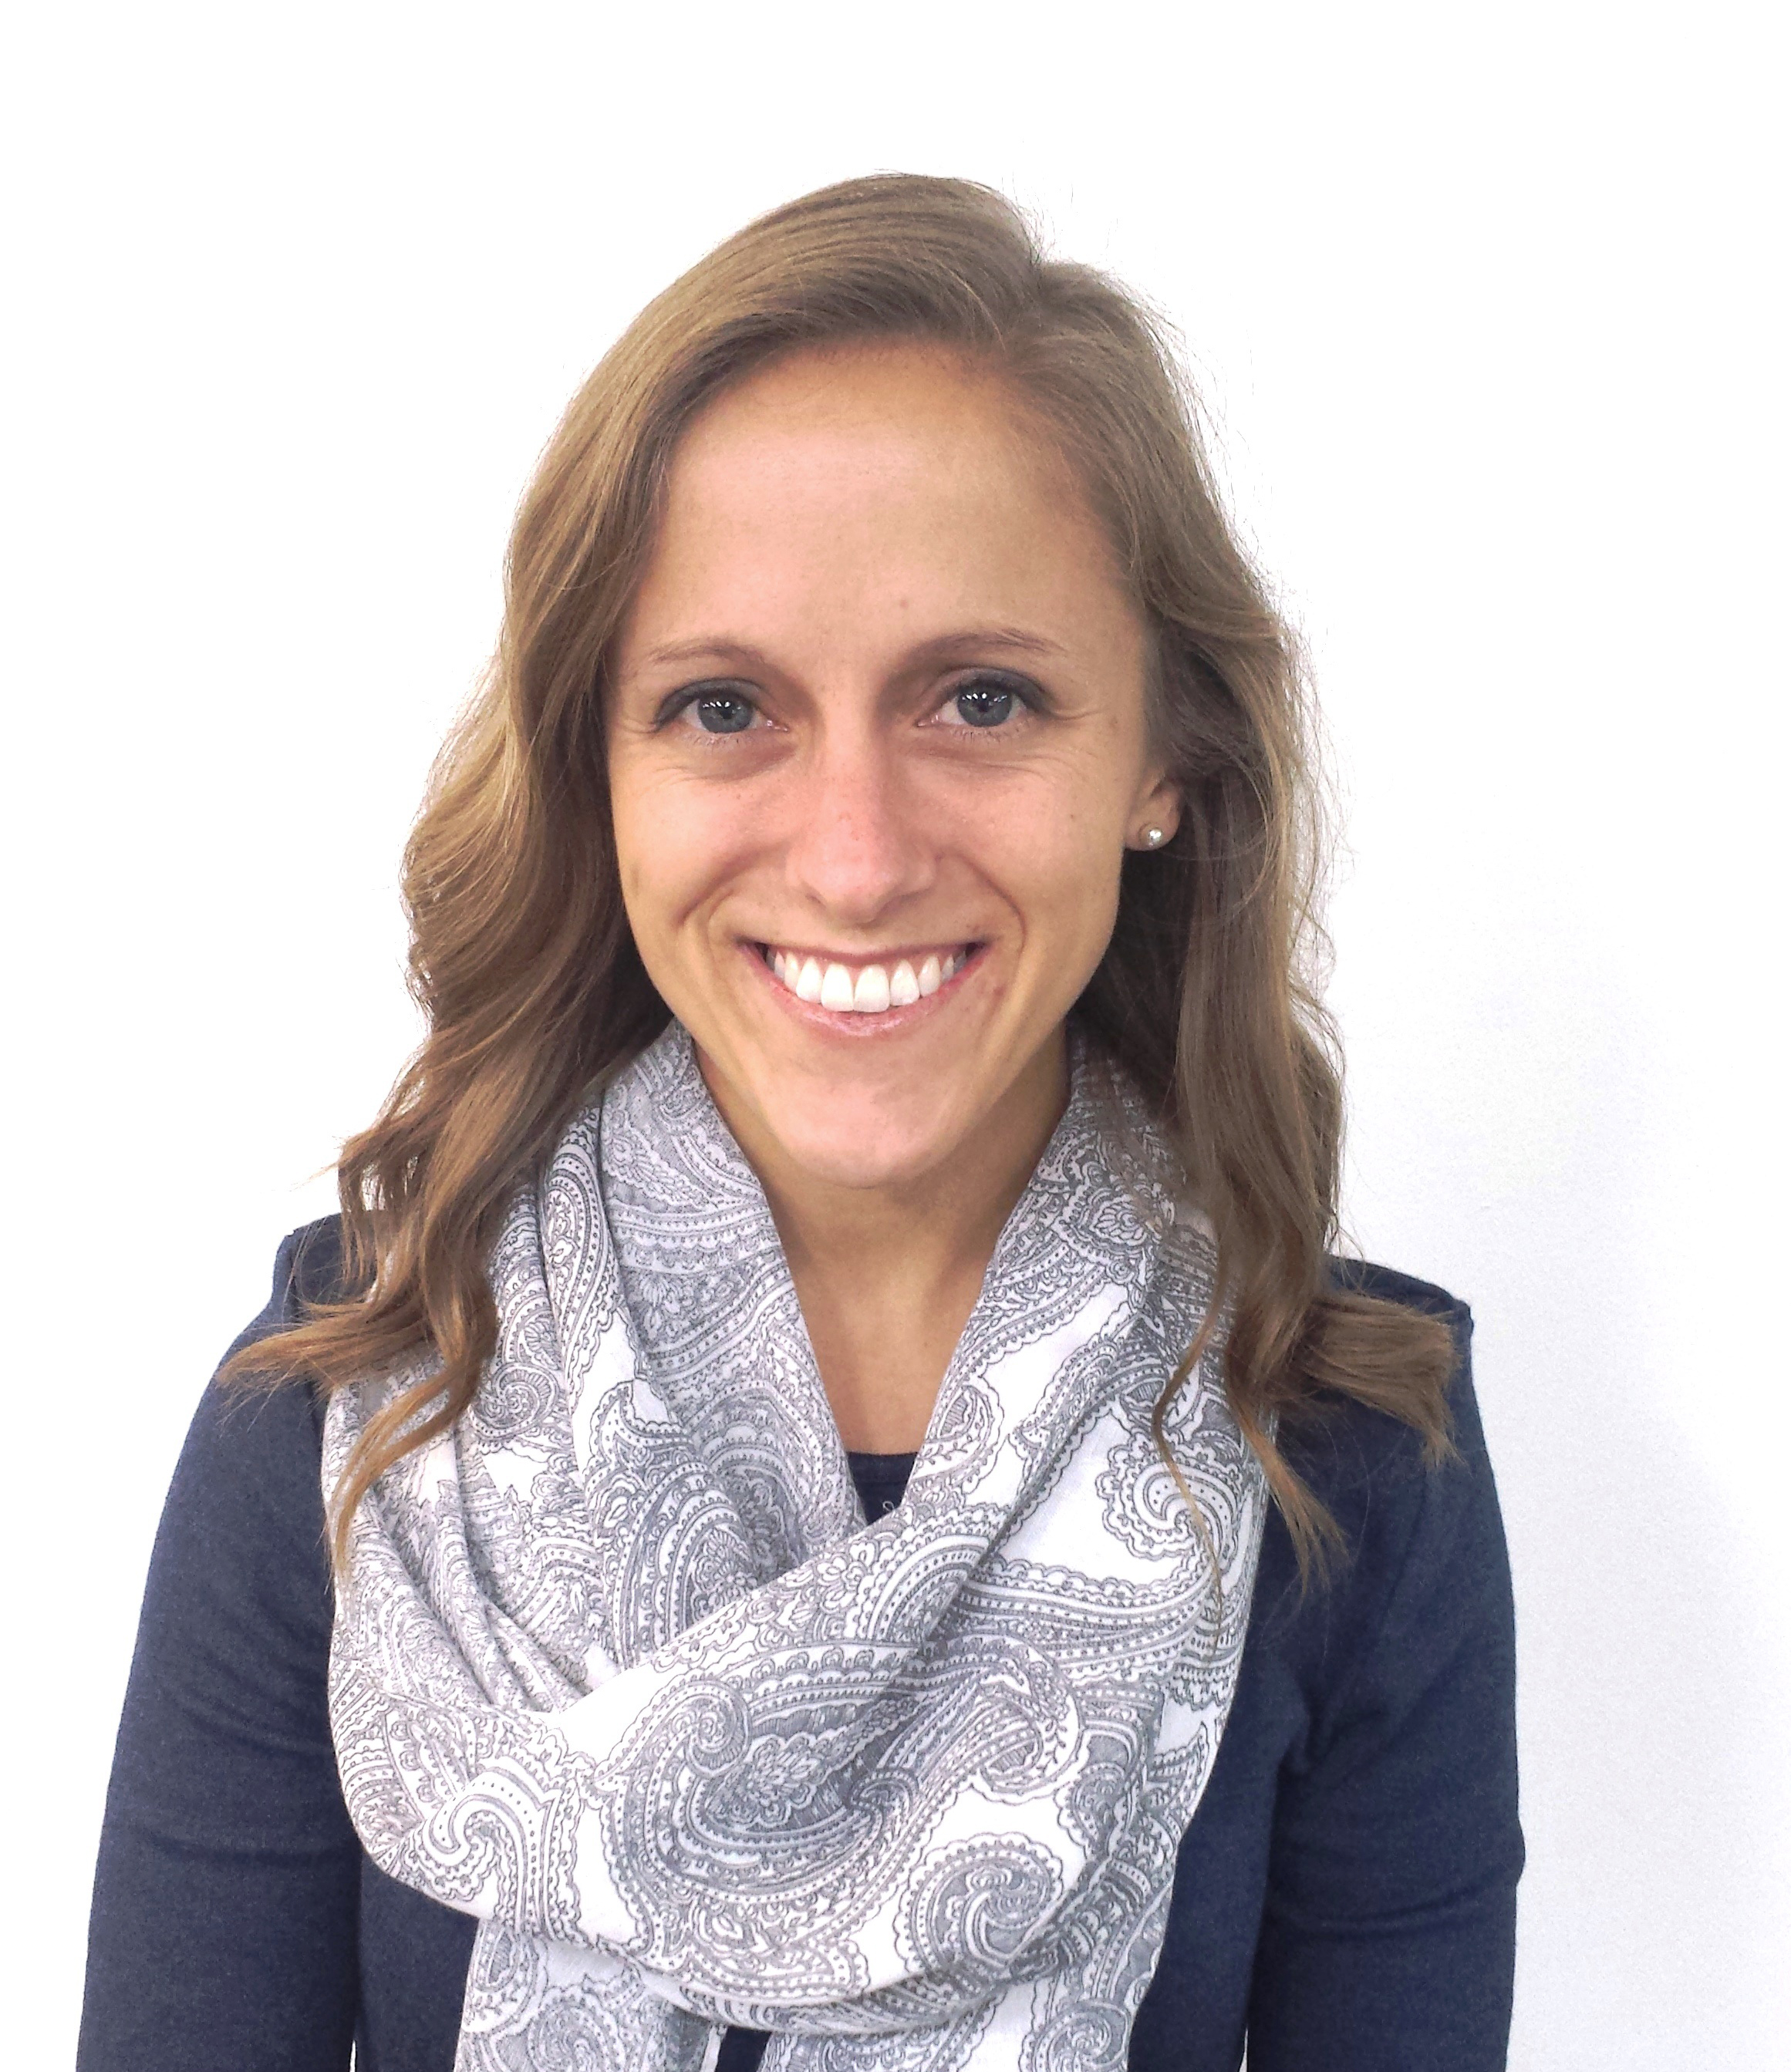 Sarah Reinhardt, Lead Food Systems & Health Analyst, Food & Environment Program